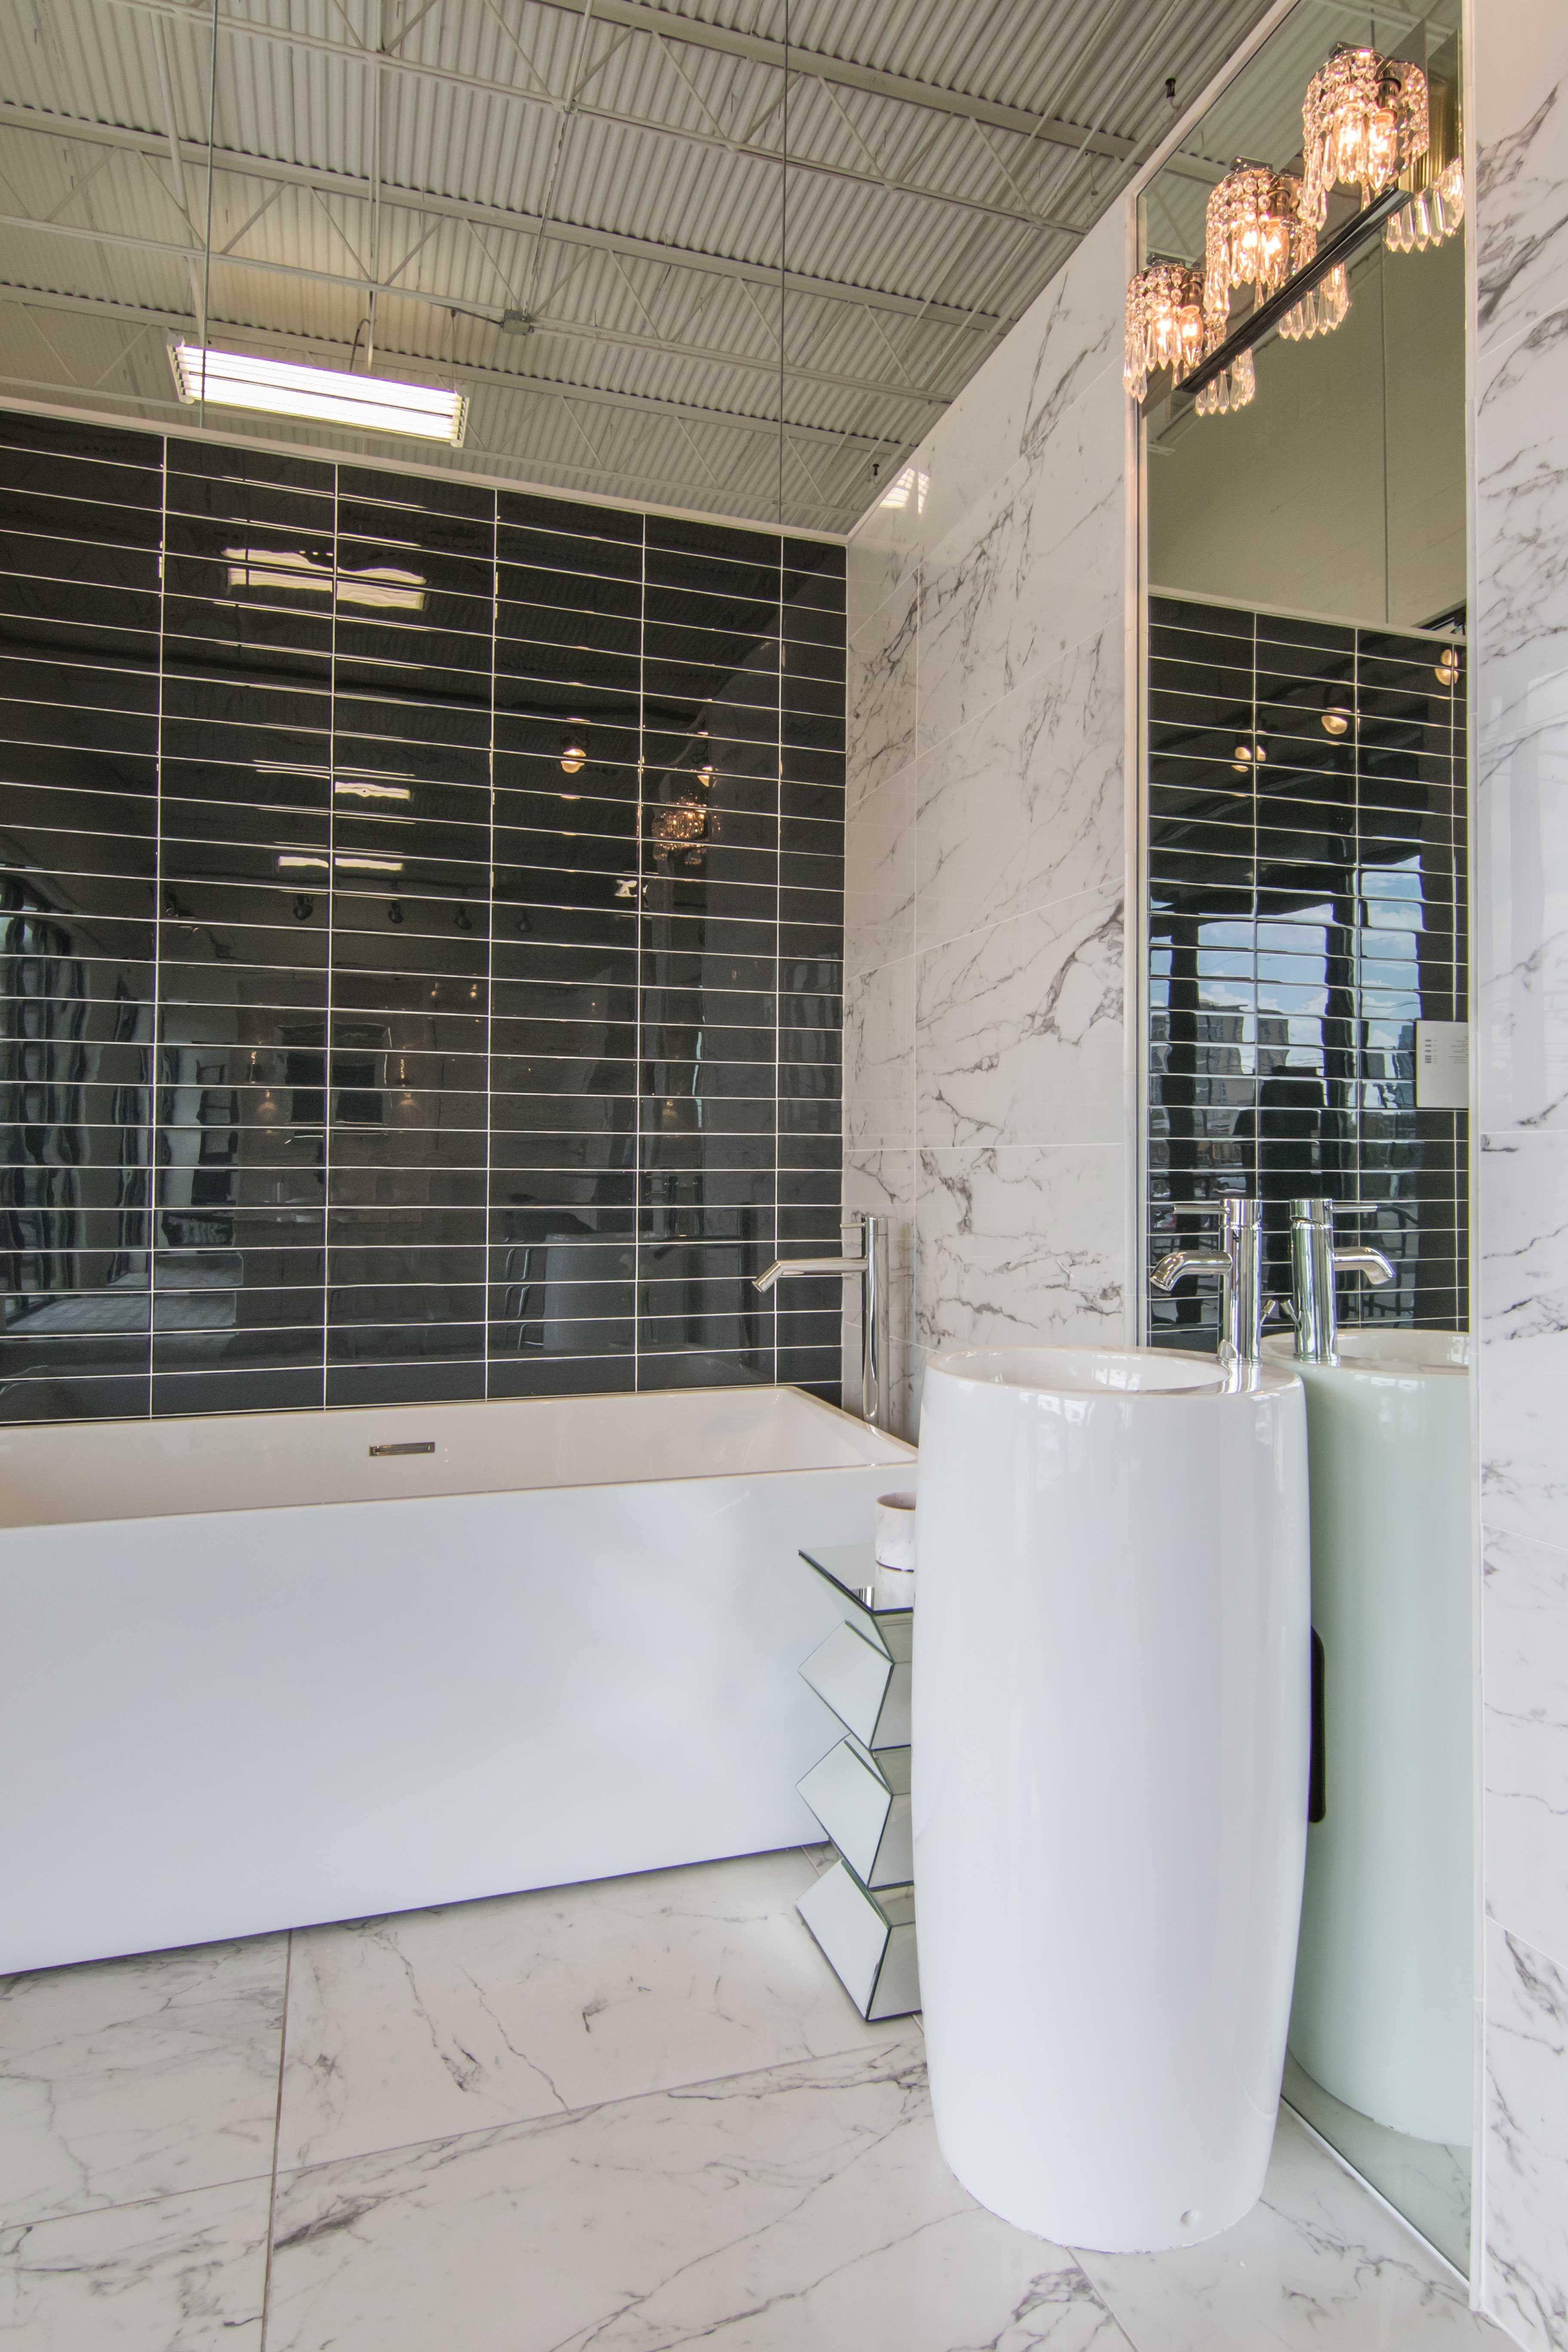 bathroom wall tile pinstripe black glass subway tile https www tileshop com product 615762 do bathroom wall tile shower tile the tile shop